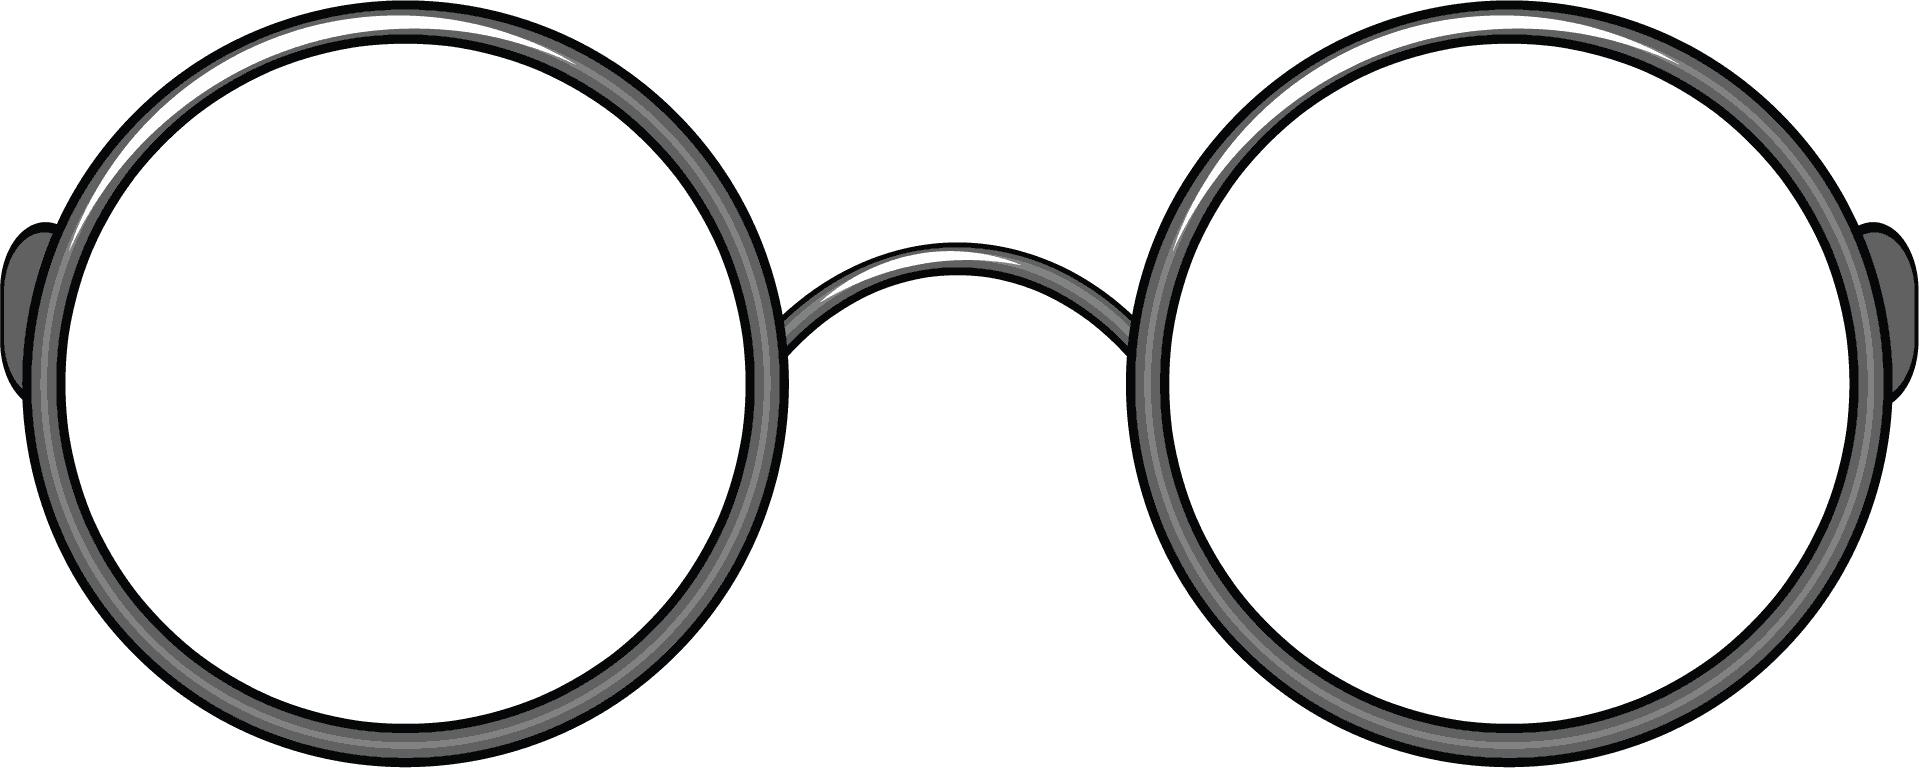 Black round glasses clipart graphic free stock Glasses Clipart | Free download best Glasses Clipart on ClipArtMag.com graphic free stock